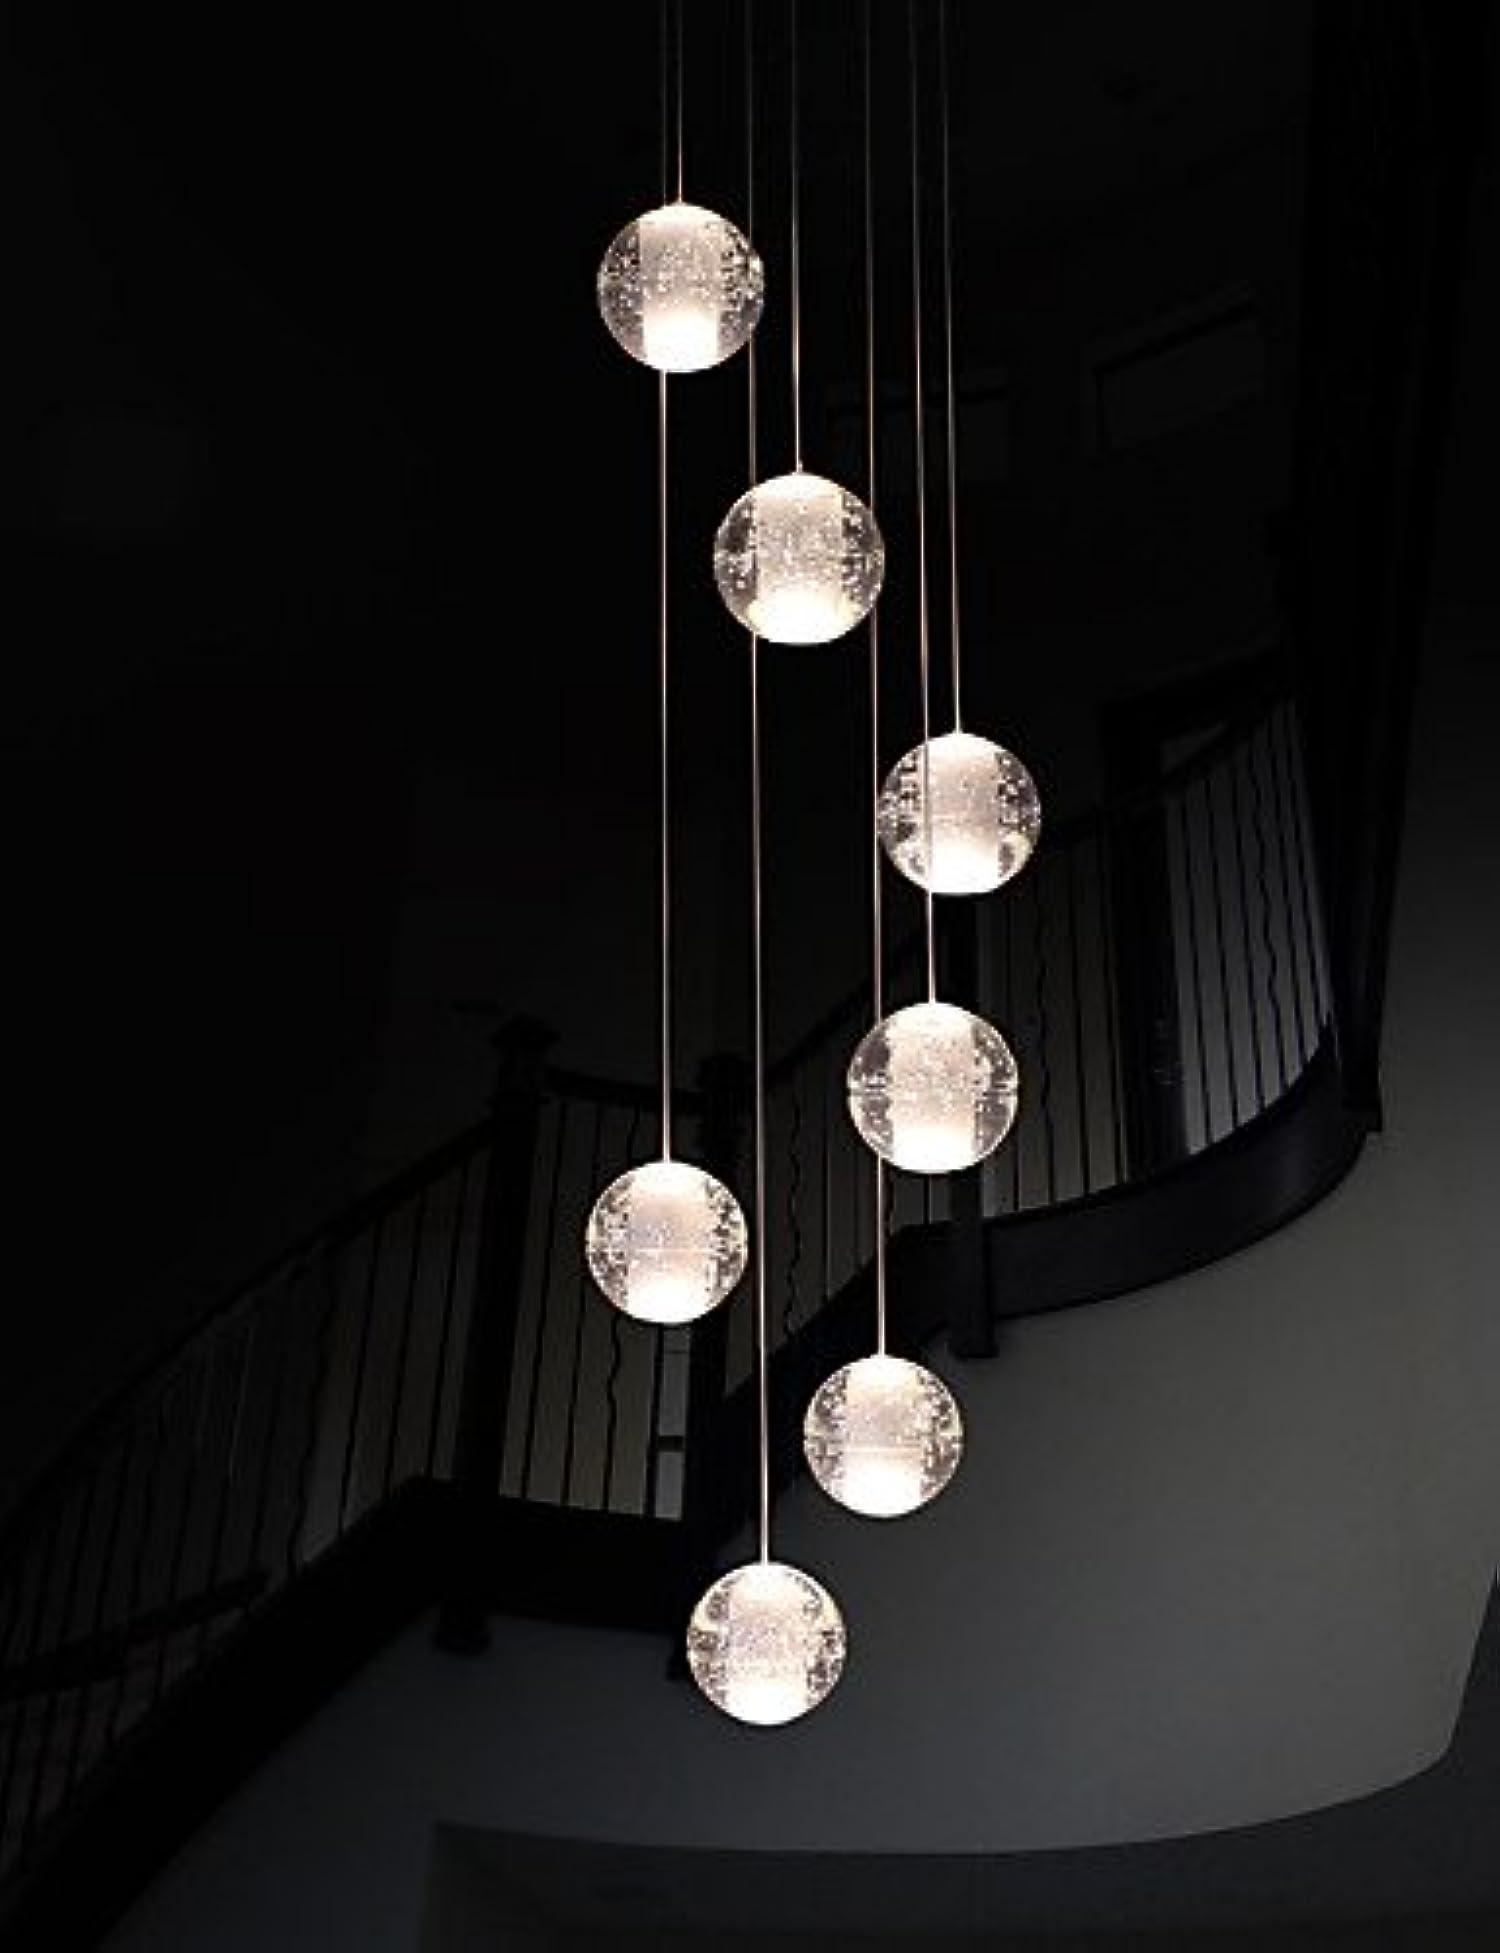 SSBY Modern Pendant Lights Pendant Lamp G4 Retroifit 7